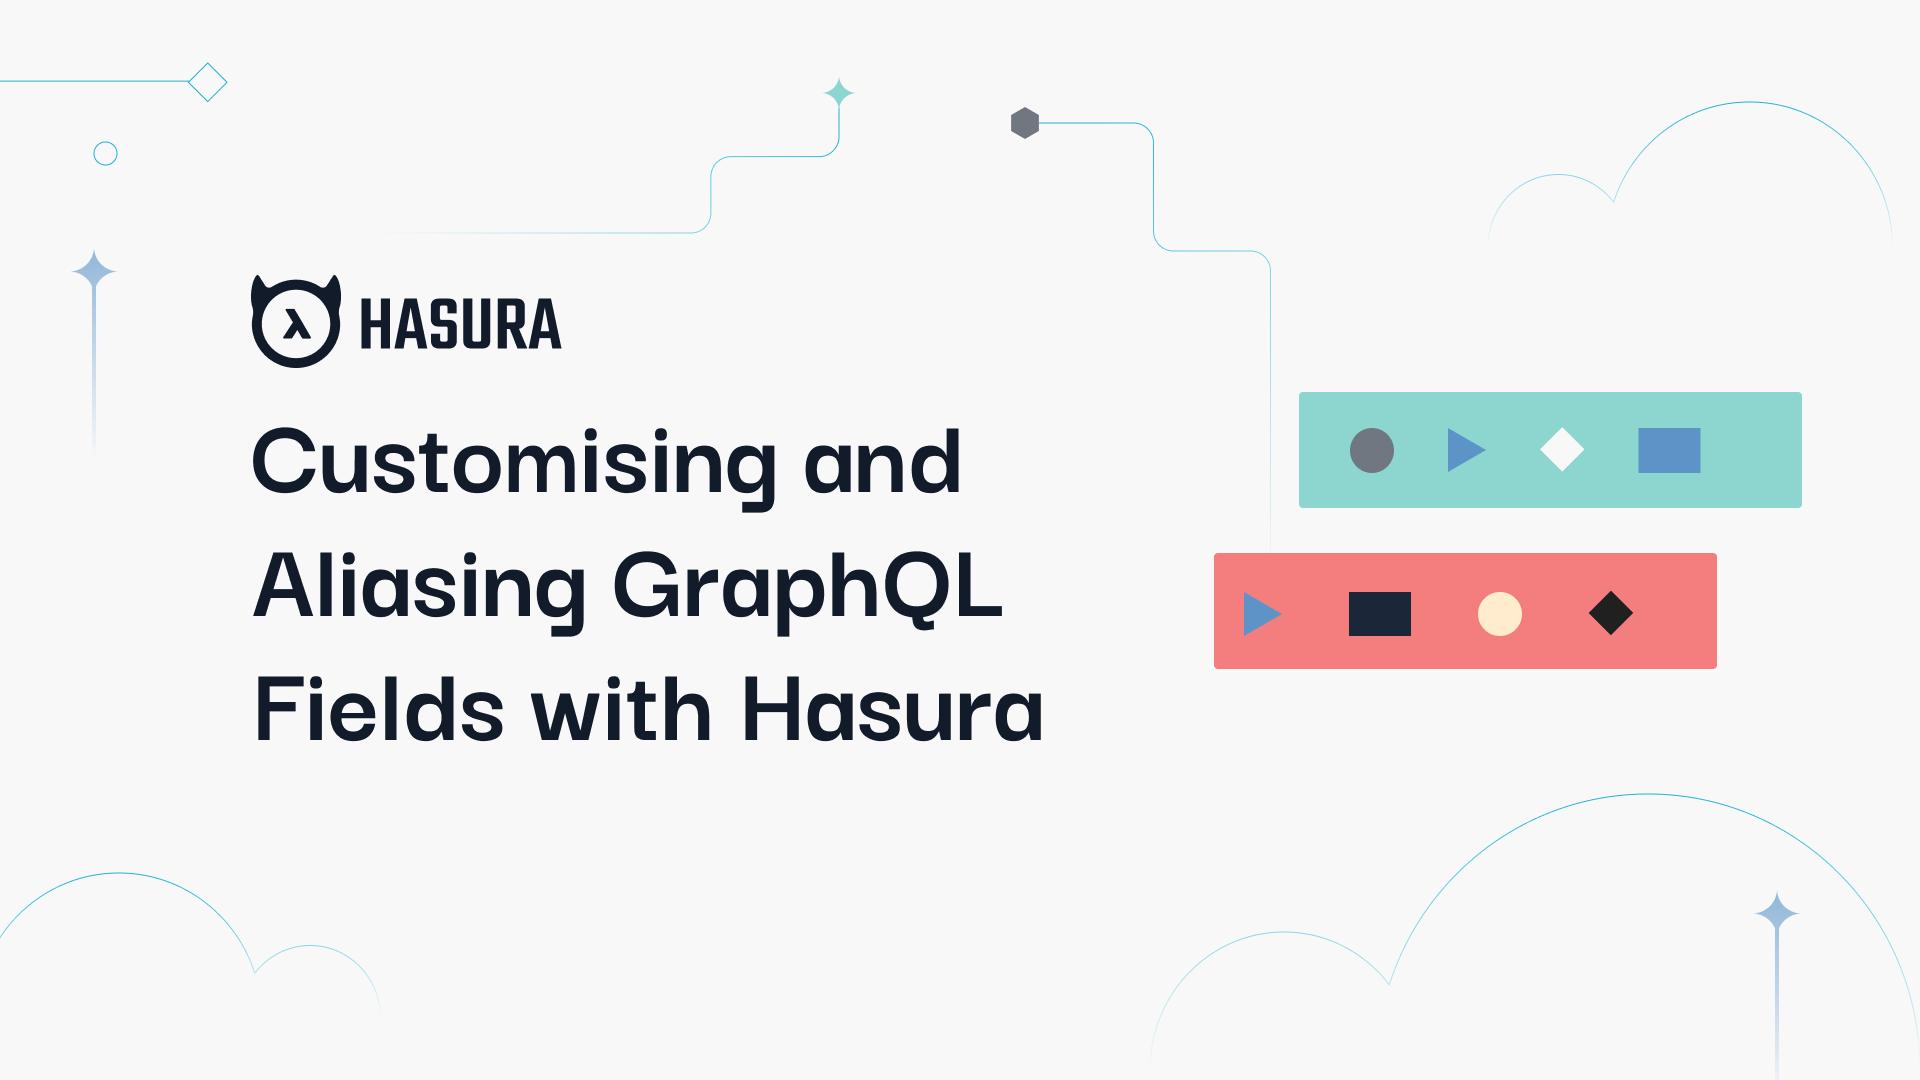 Customising and Aliasing GraphQL Fields with Hasura